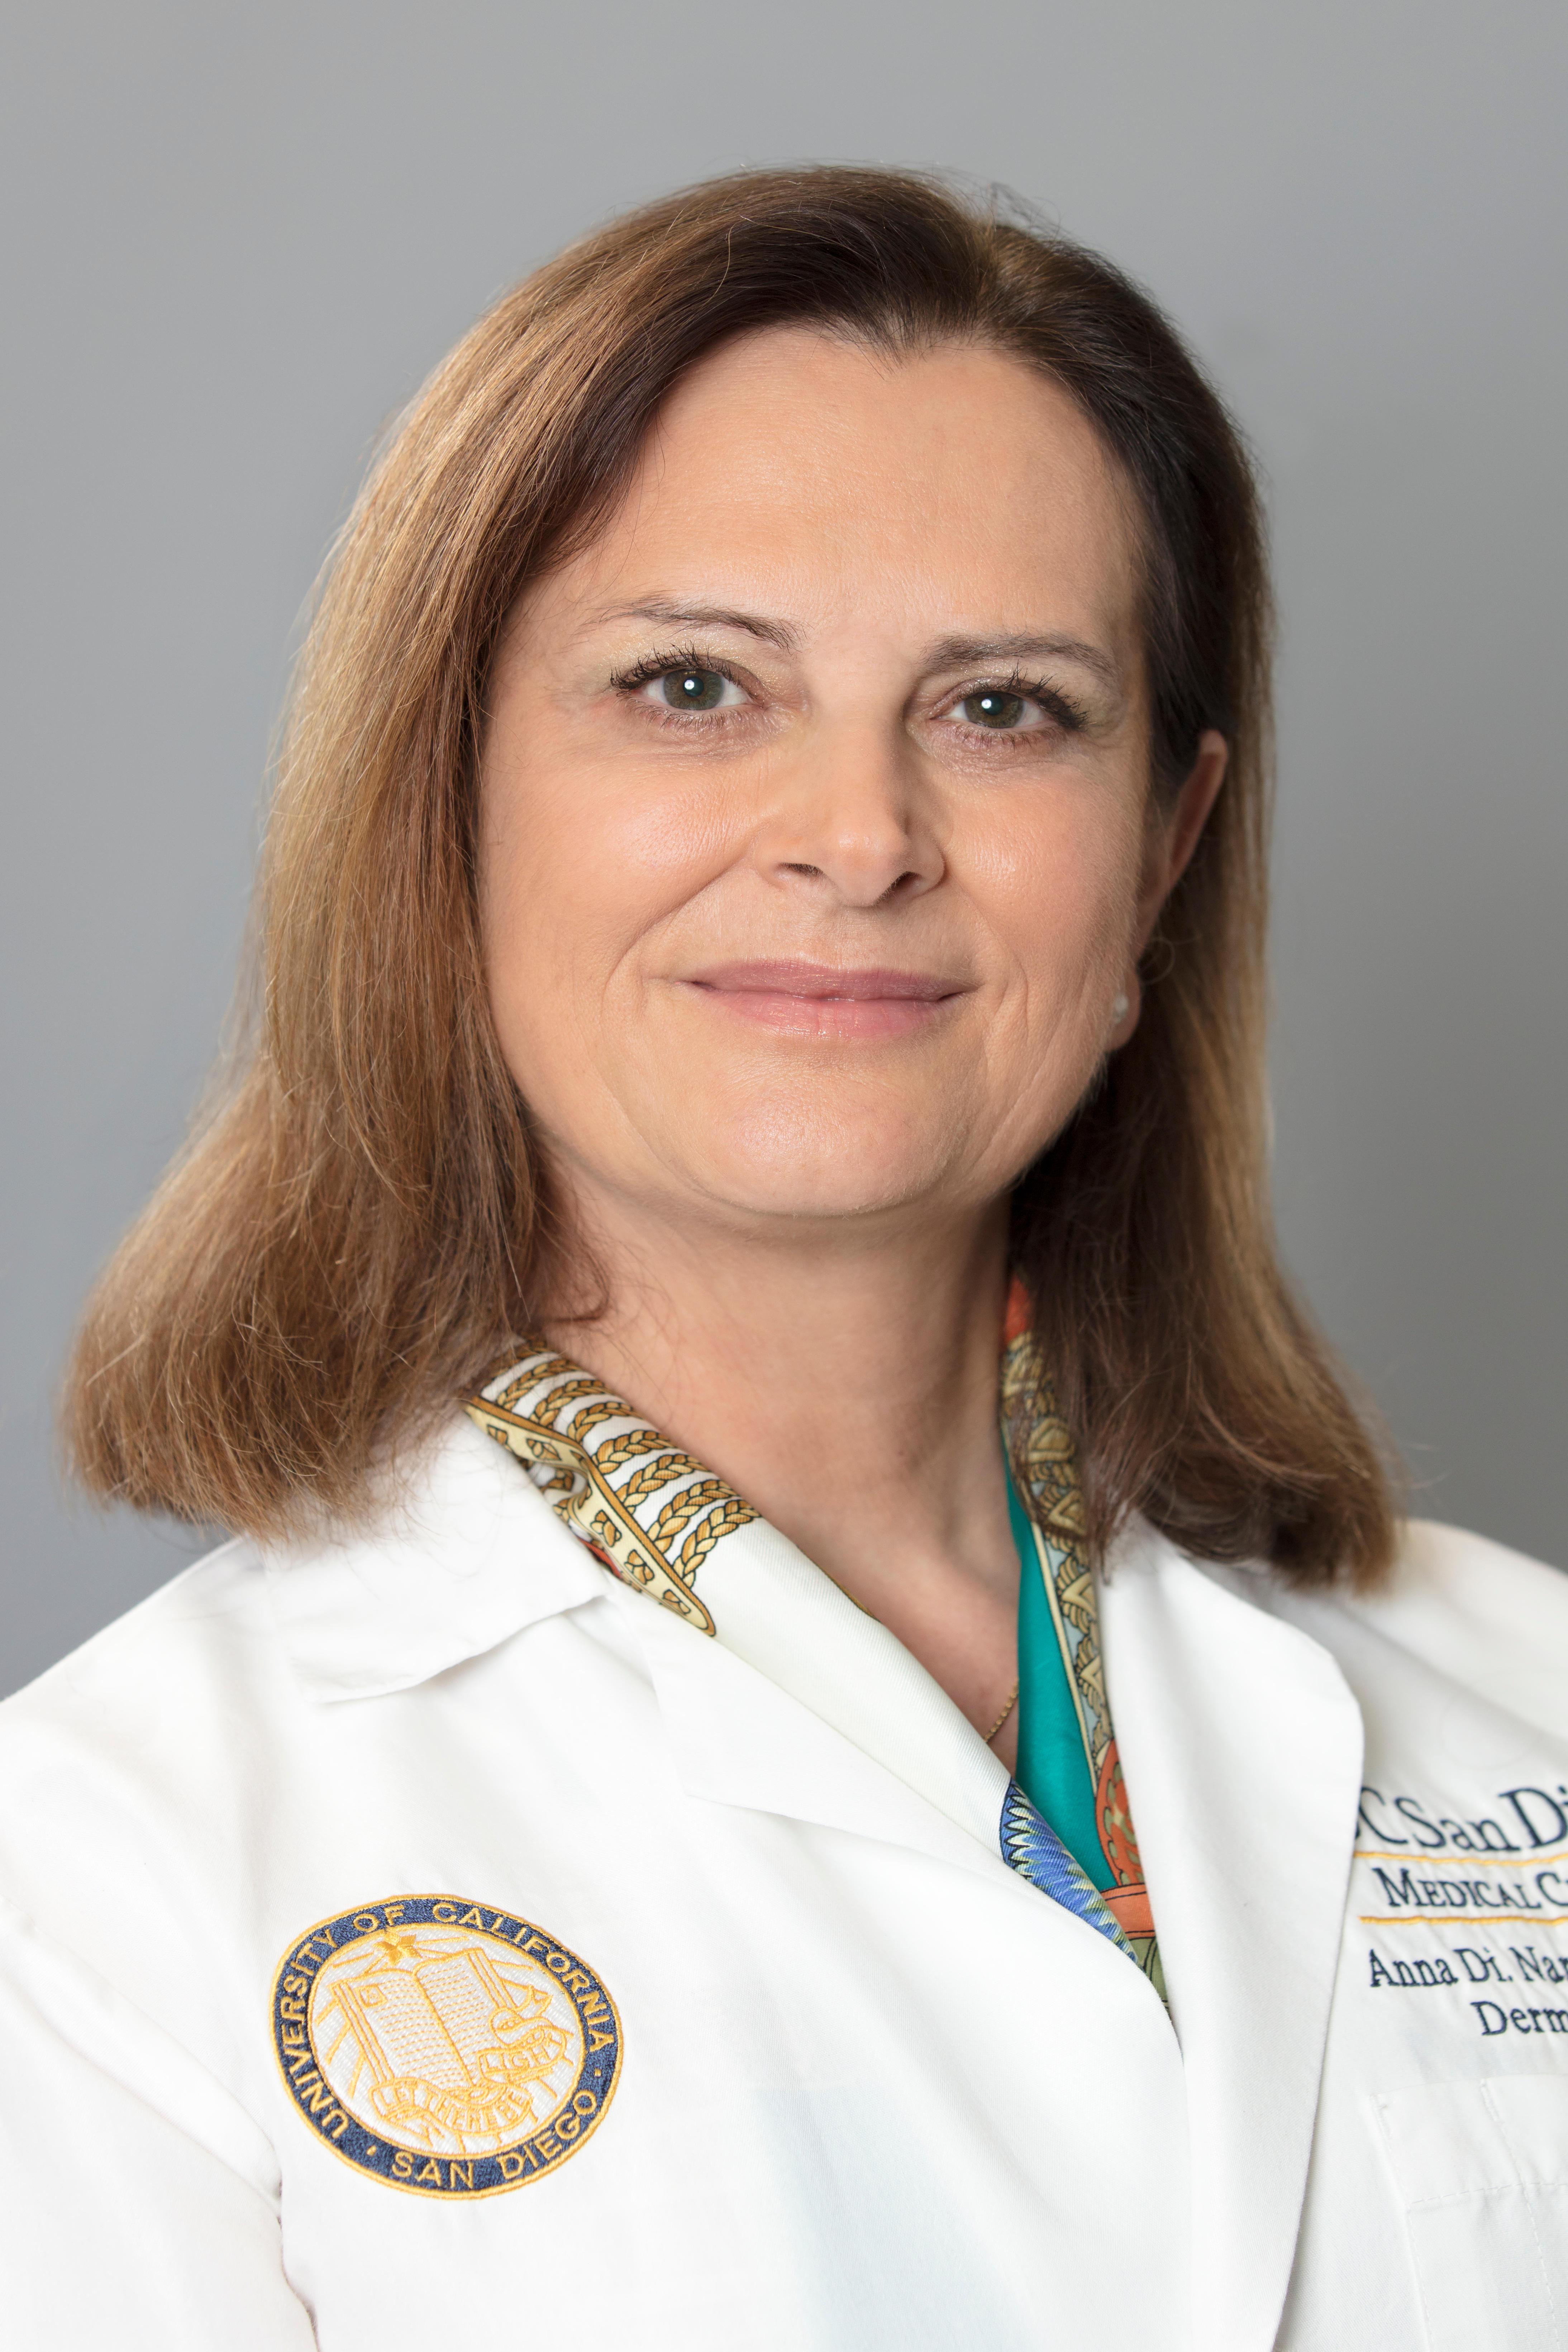 Image For Dr. Anna  Di Nardo MD, PHD